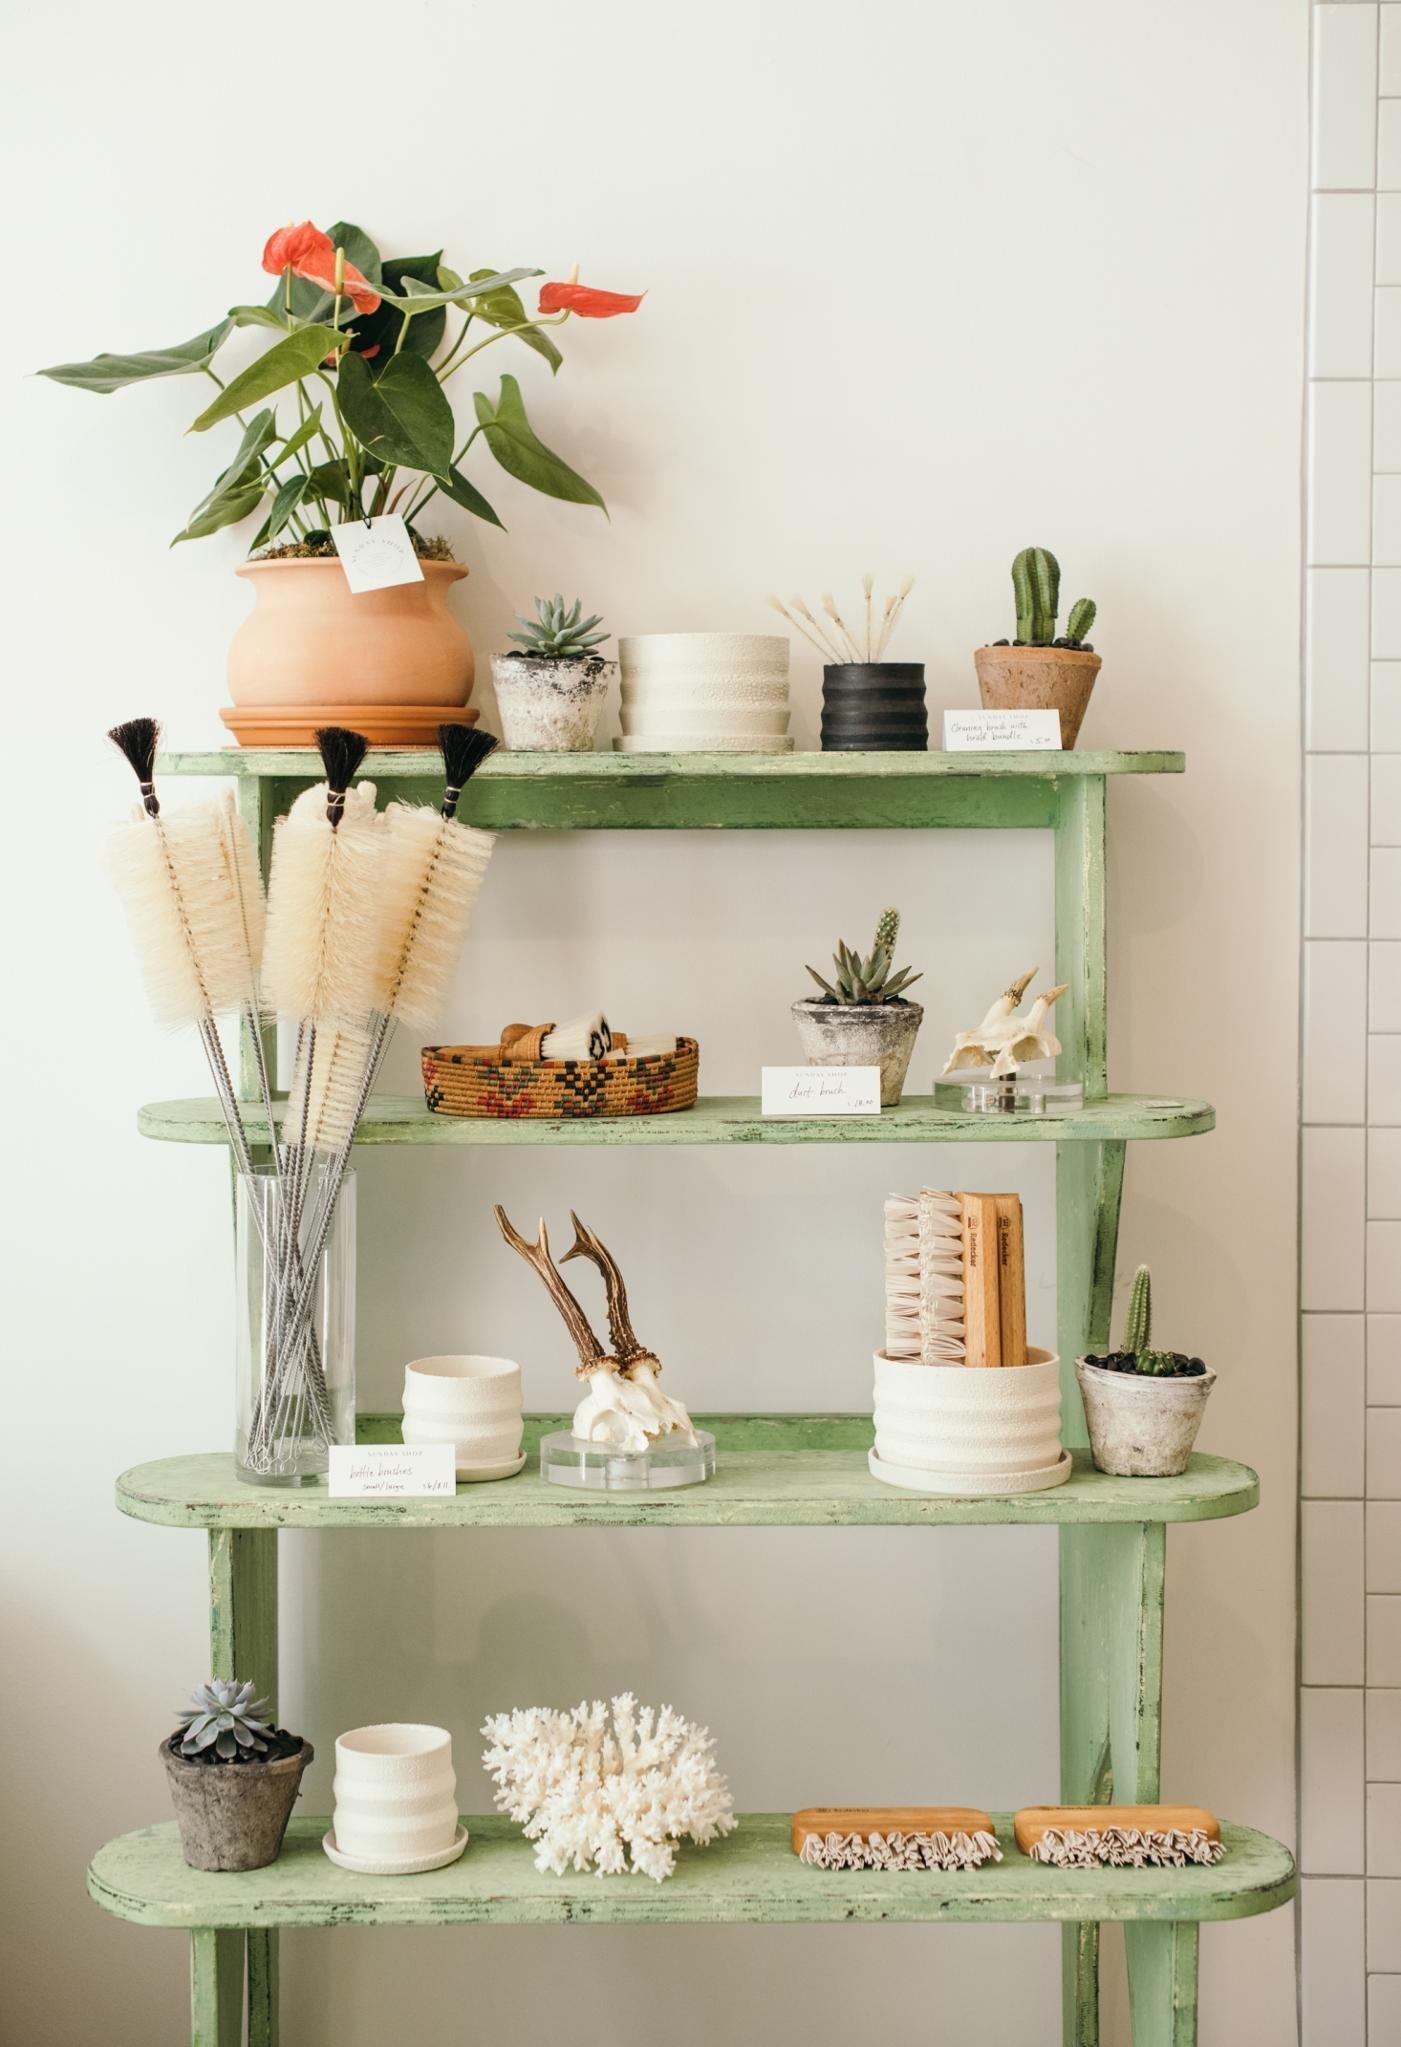 shopper s diary sunday shop in new orleans tabletop vintage rh pinterest com